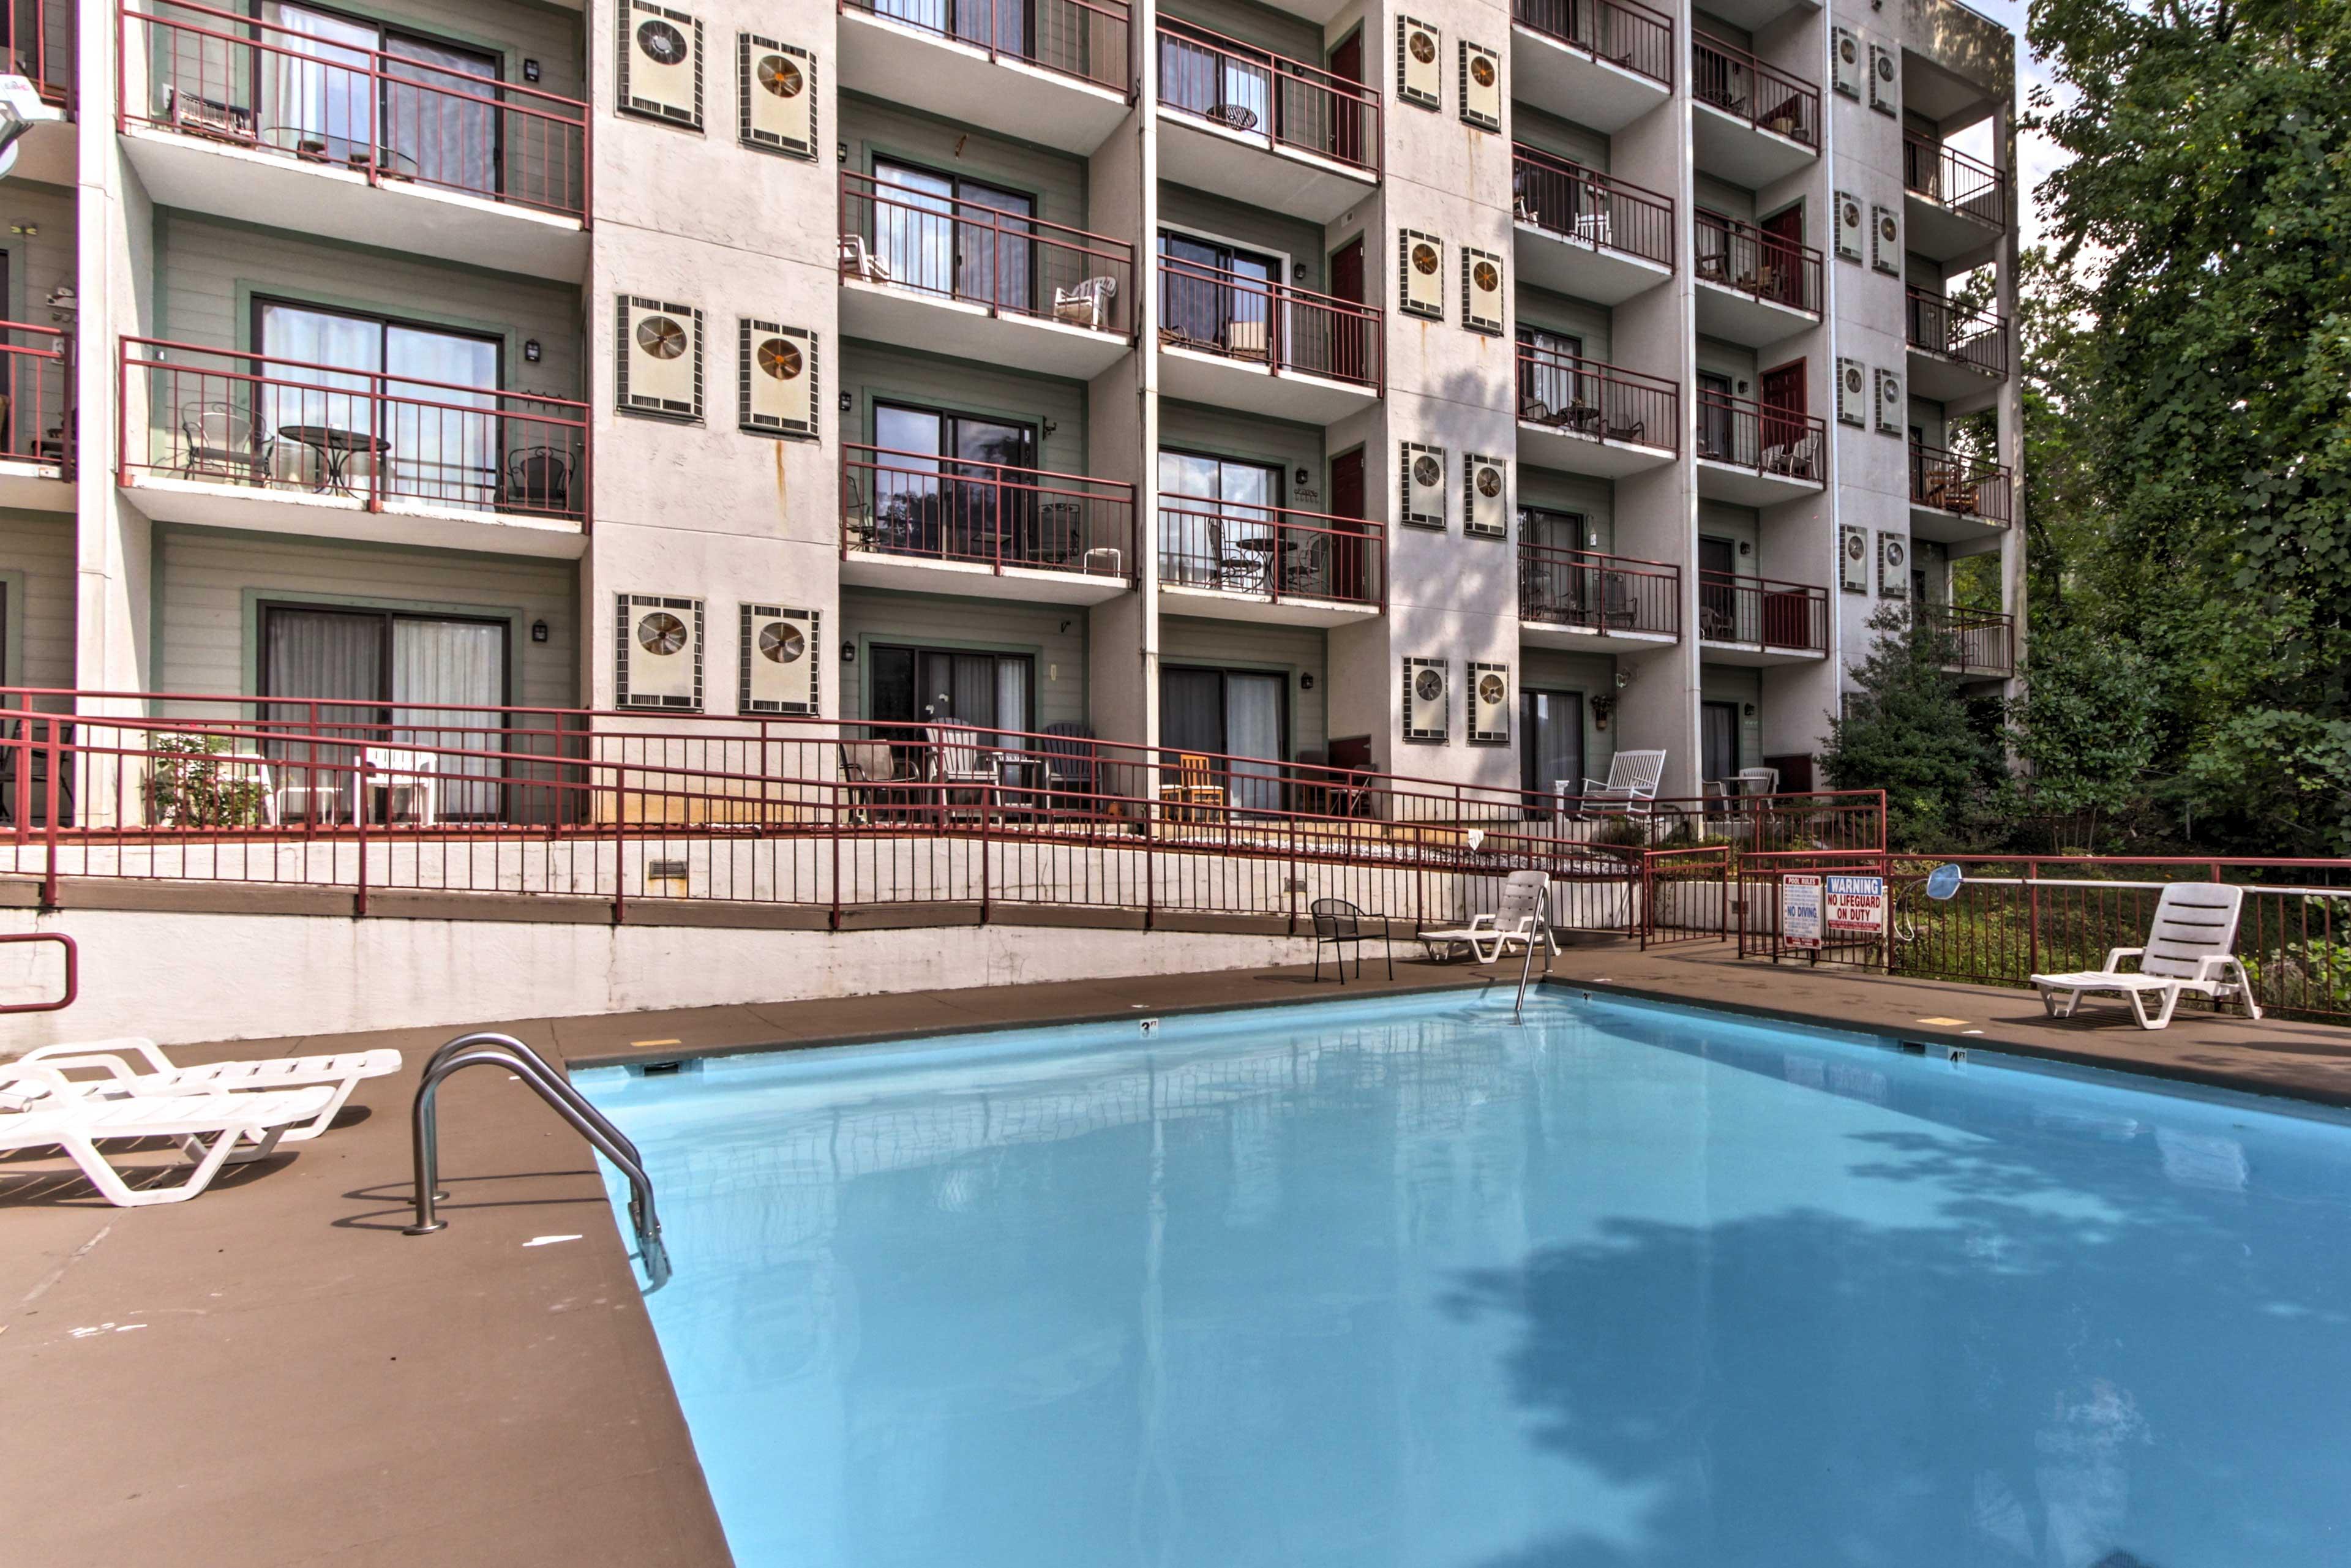 Enjoy access to the Laurel Inn Condos community pool.